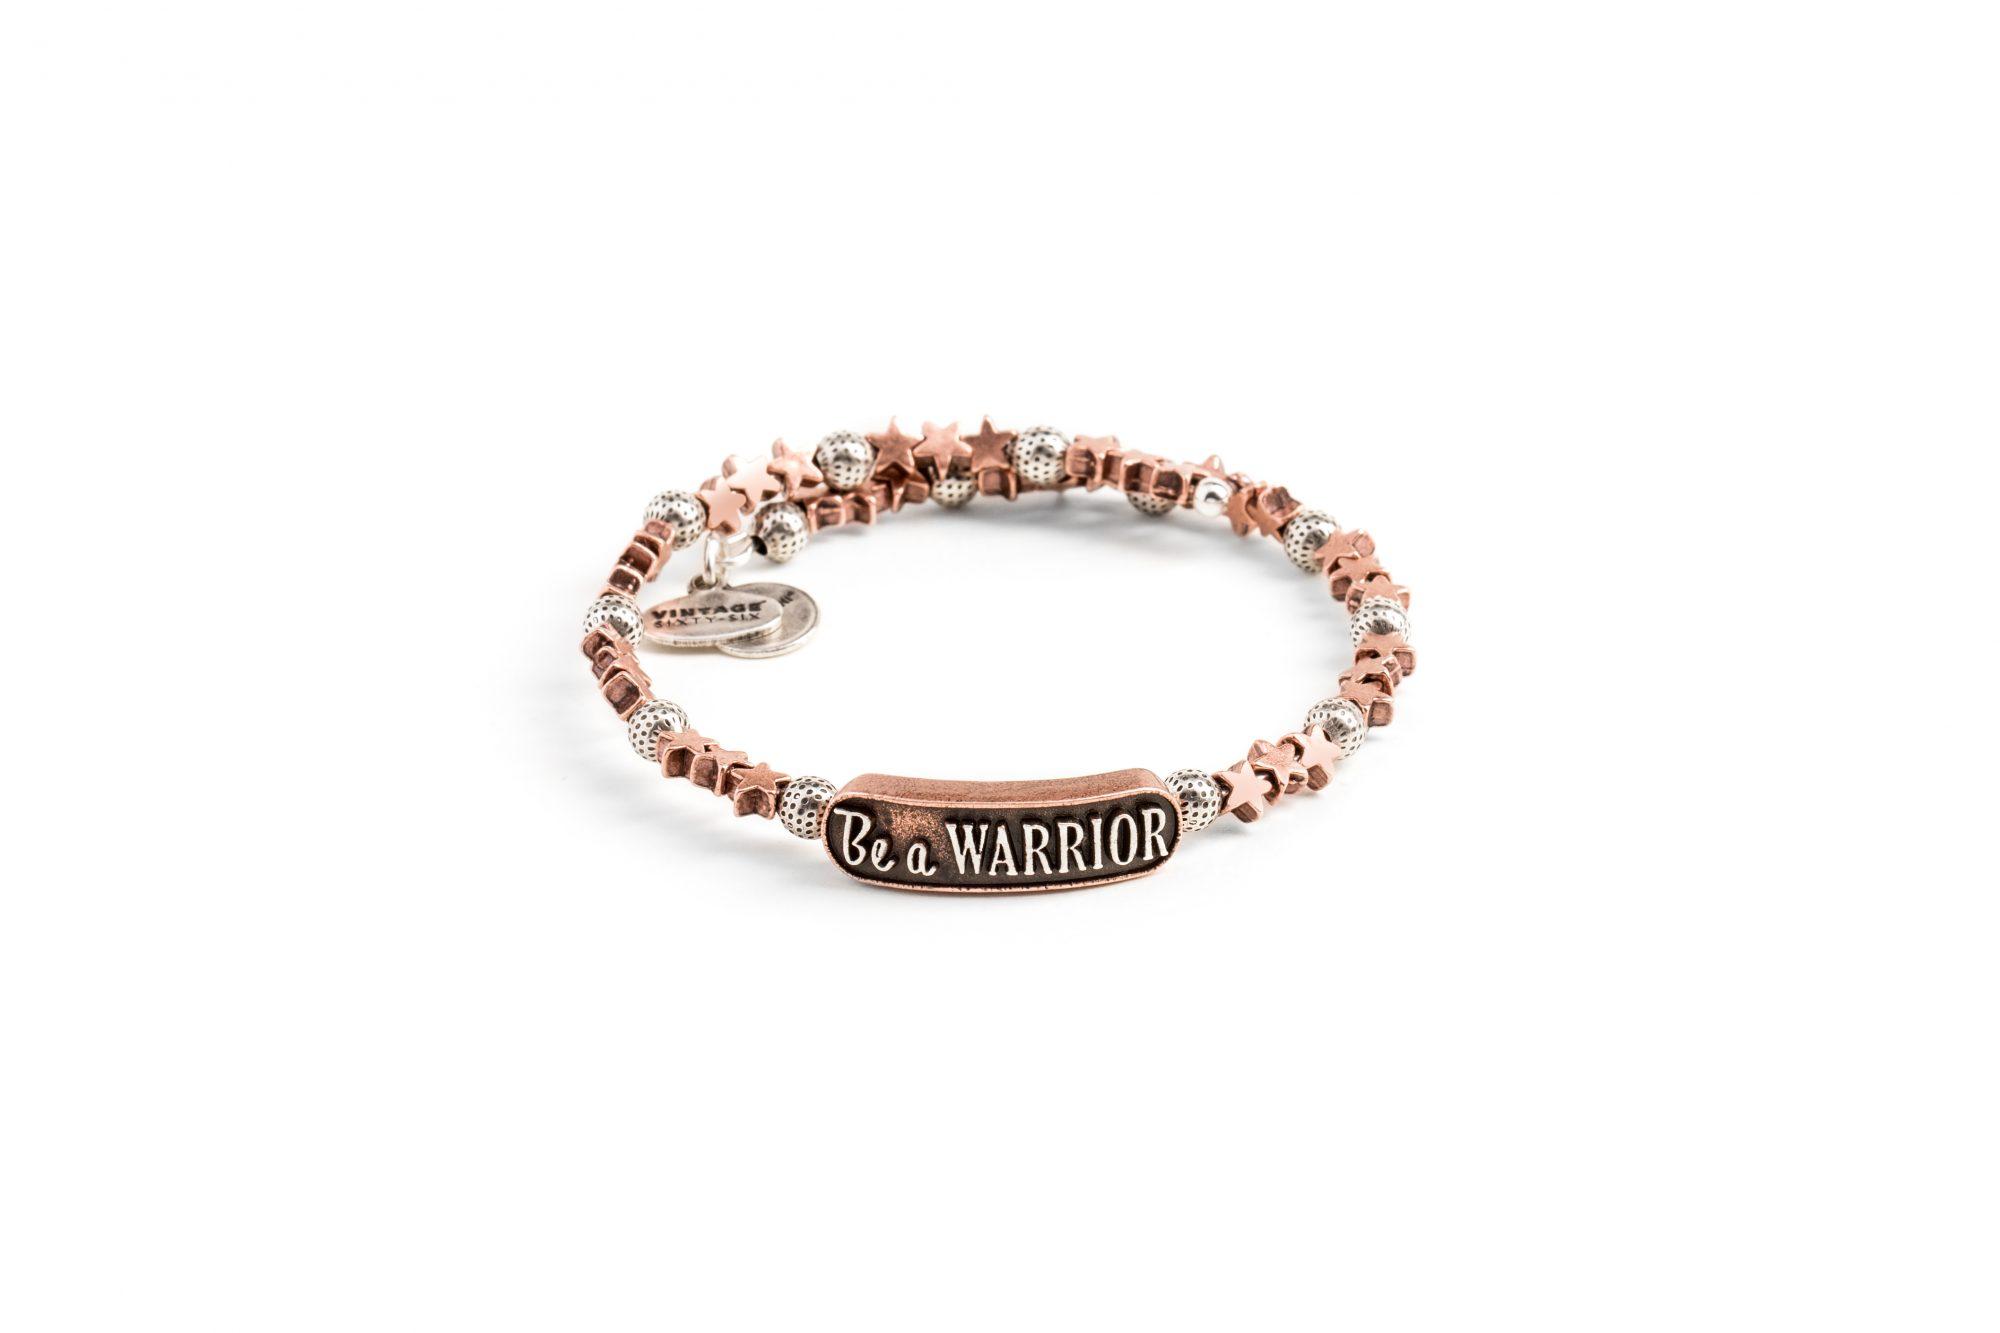 awit-be-warrior-bracelet.jpg